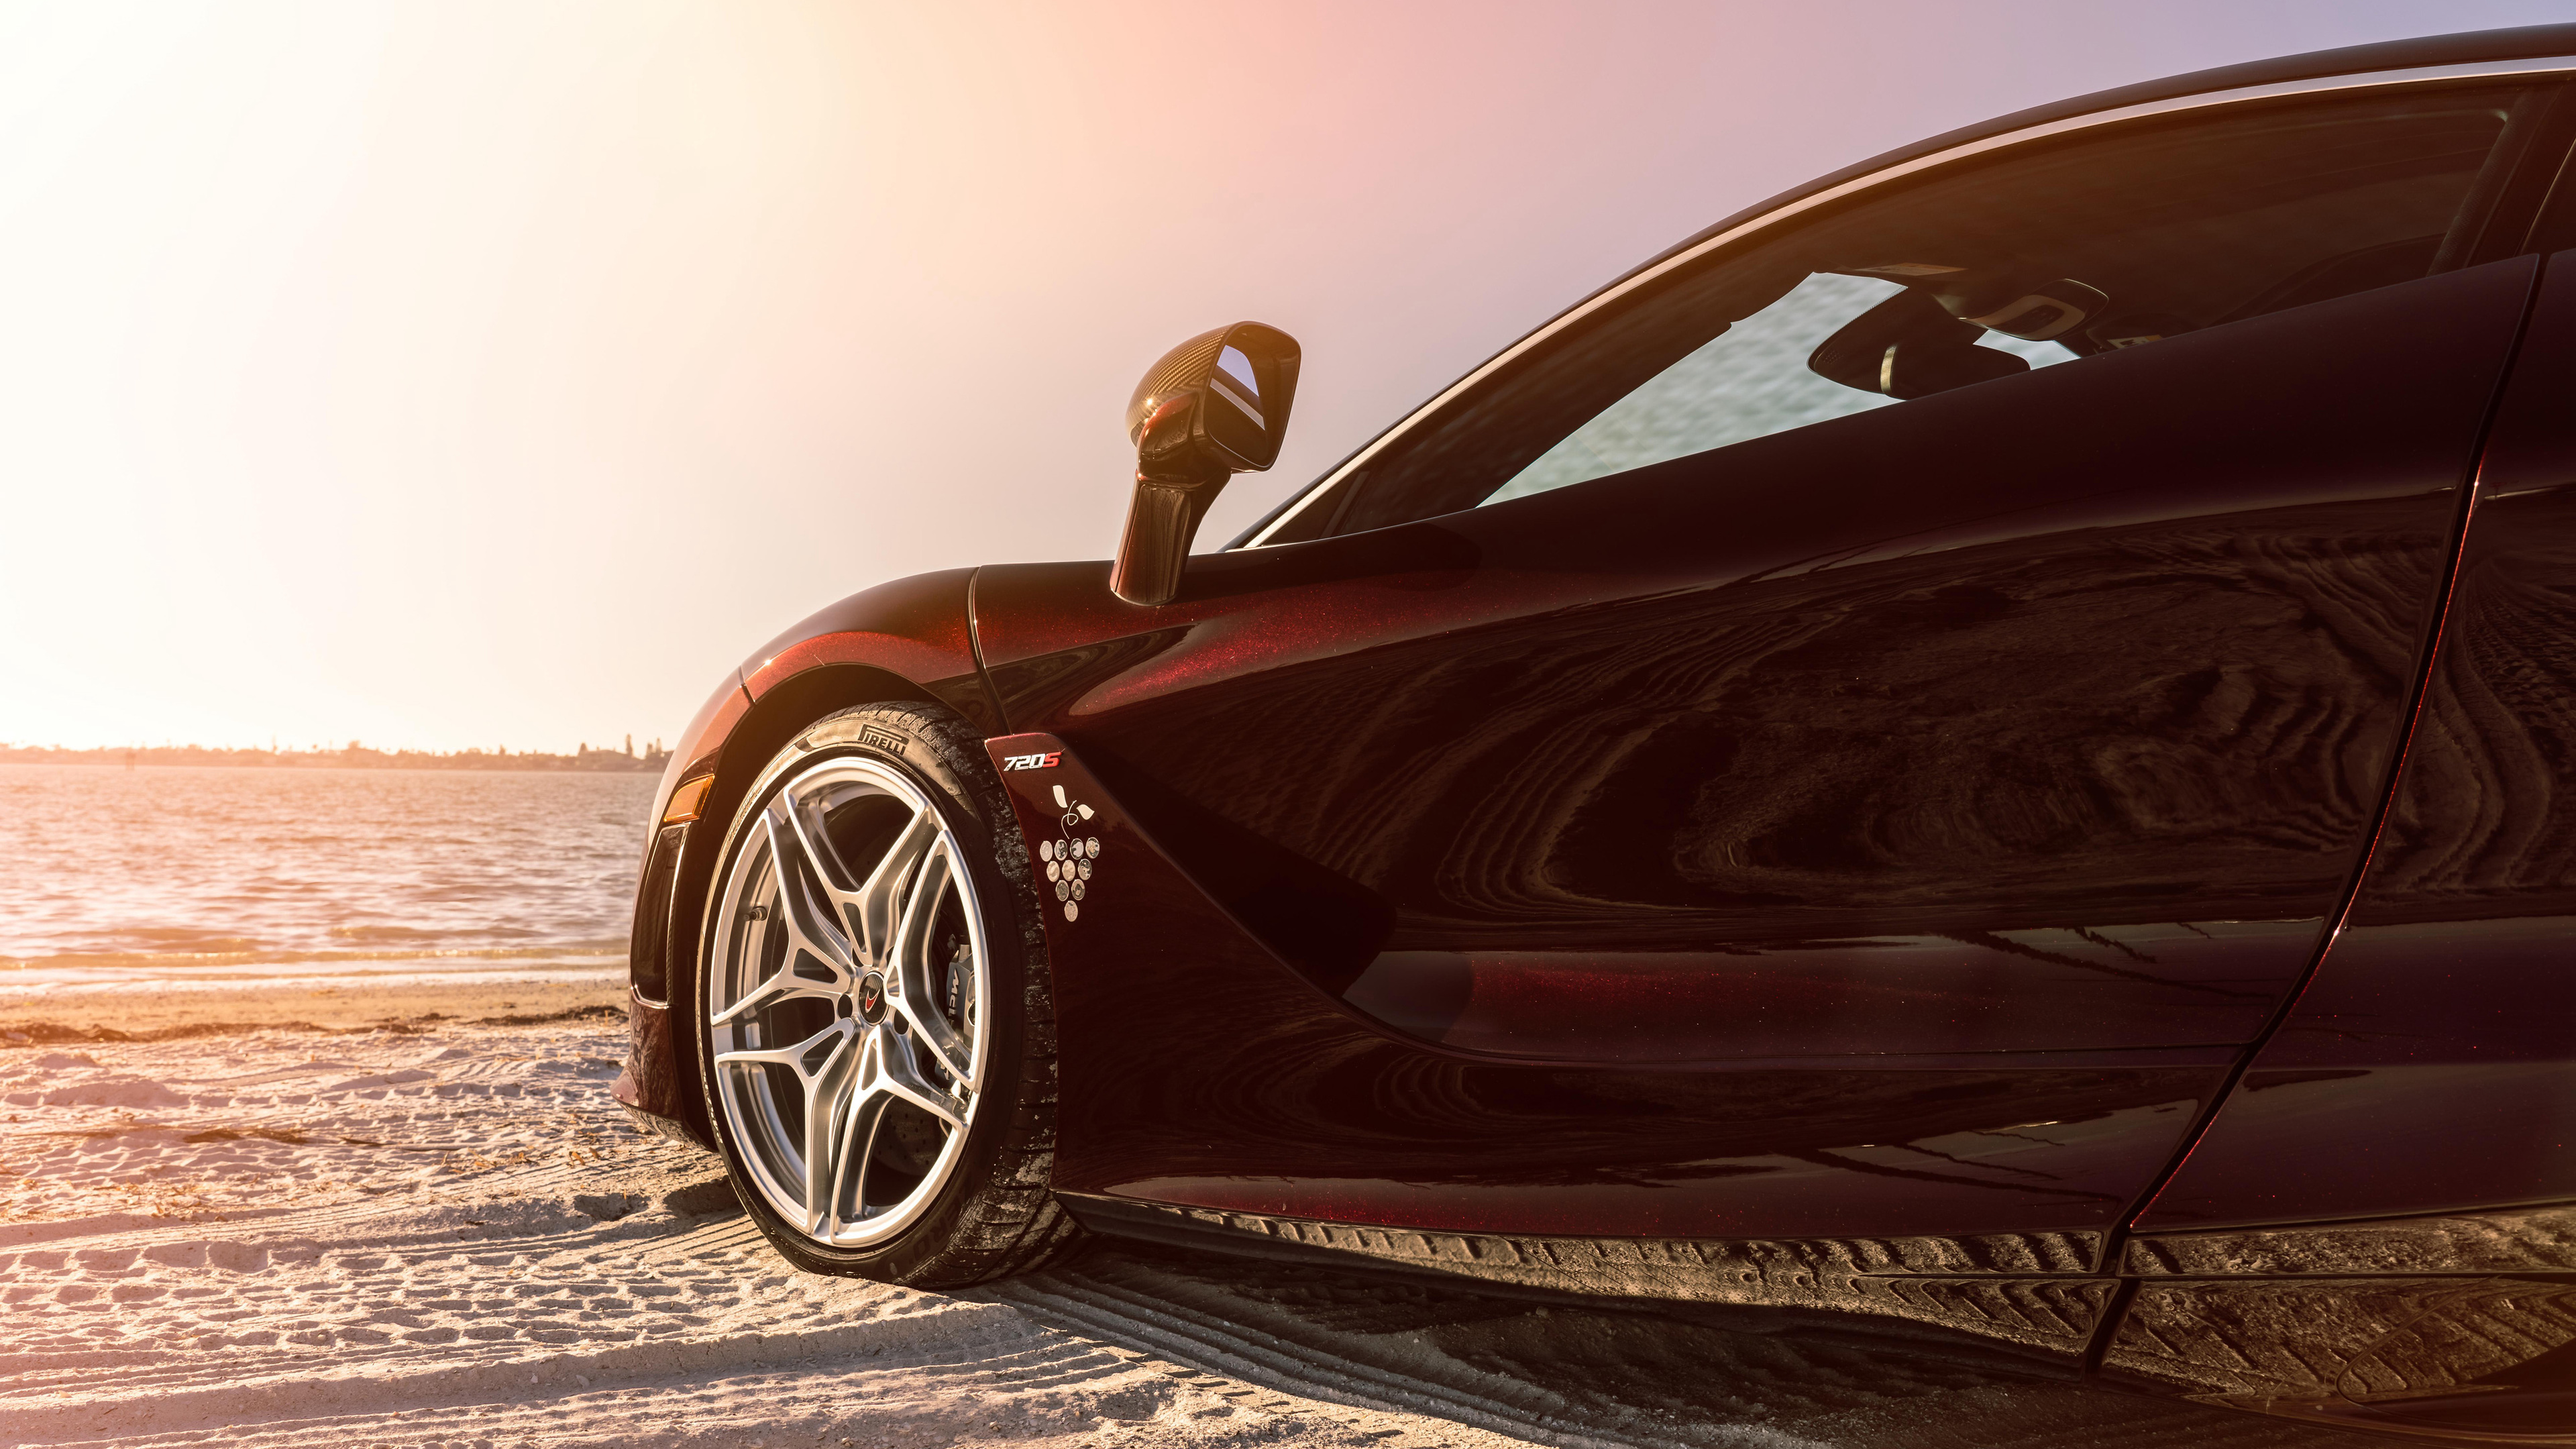 2018 mclaren mso 720s coupe 1539109277 - 2018 McLaren MSO 720S Coupe - mclaren wallpapers, mclaren 720s wallpapers, hd-wallpapers, cars wallpapers, 4k-wallpapers, 2018 cars wallpapers